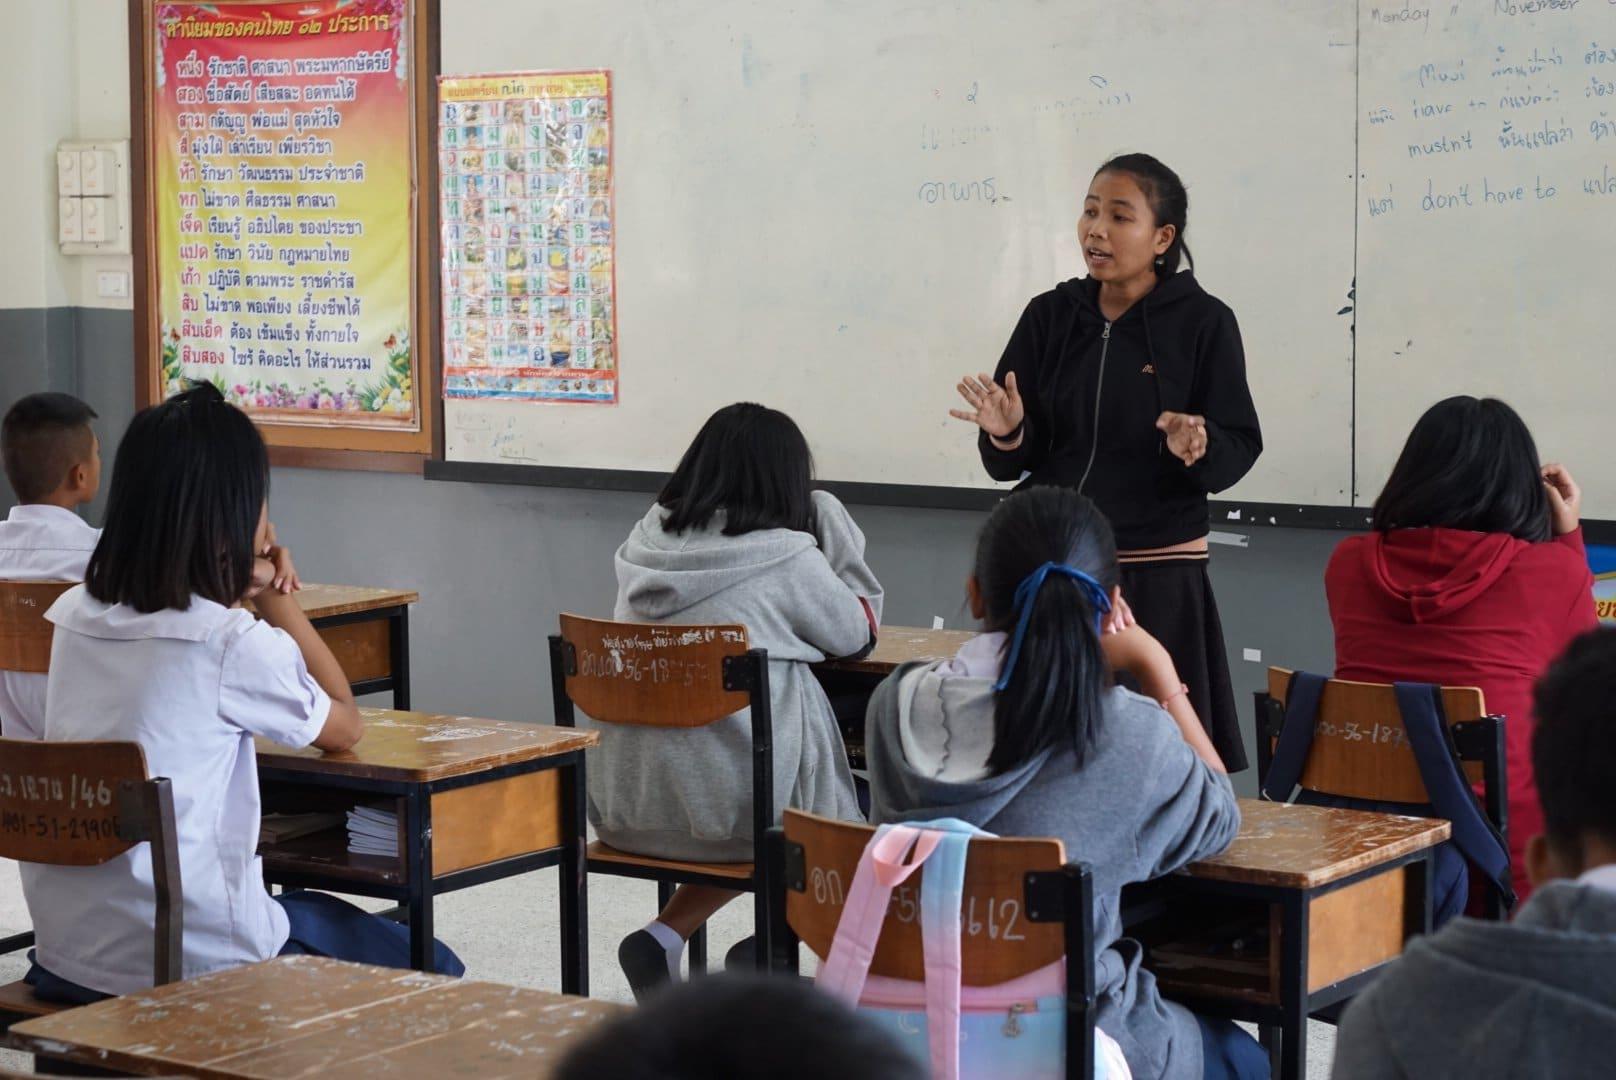 A Journey to Khon Kaen (Part 1): A Khon Kaen school pilots a new data-driven tool to help improve teaching and learning 1